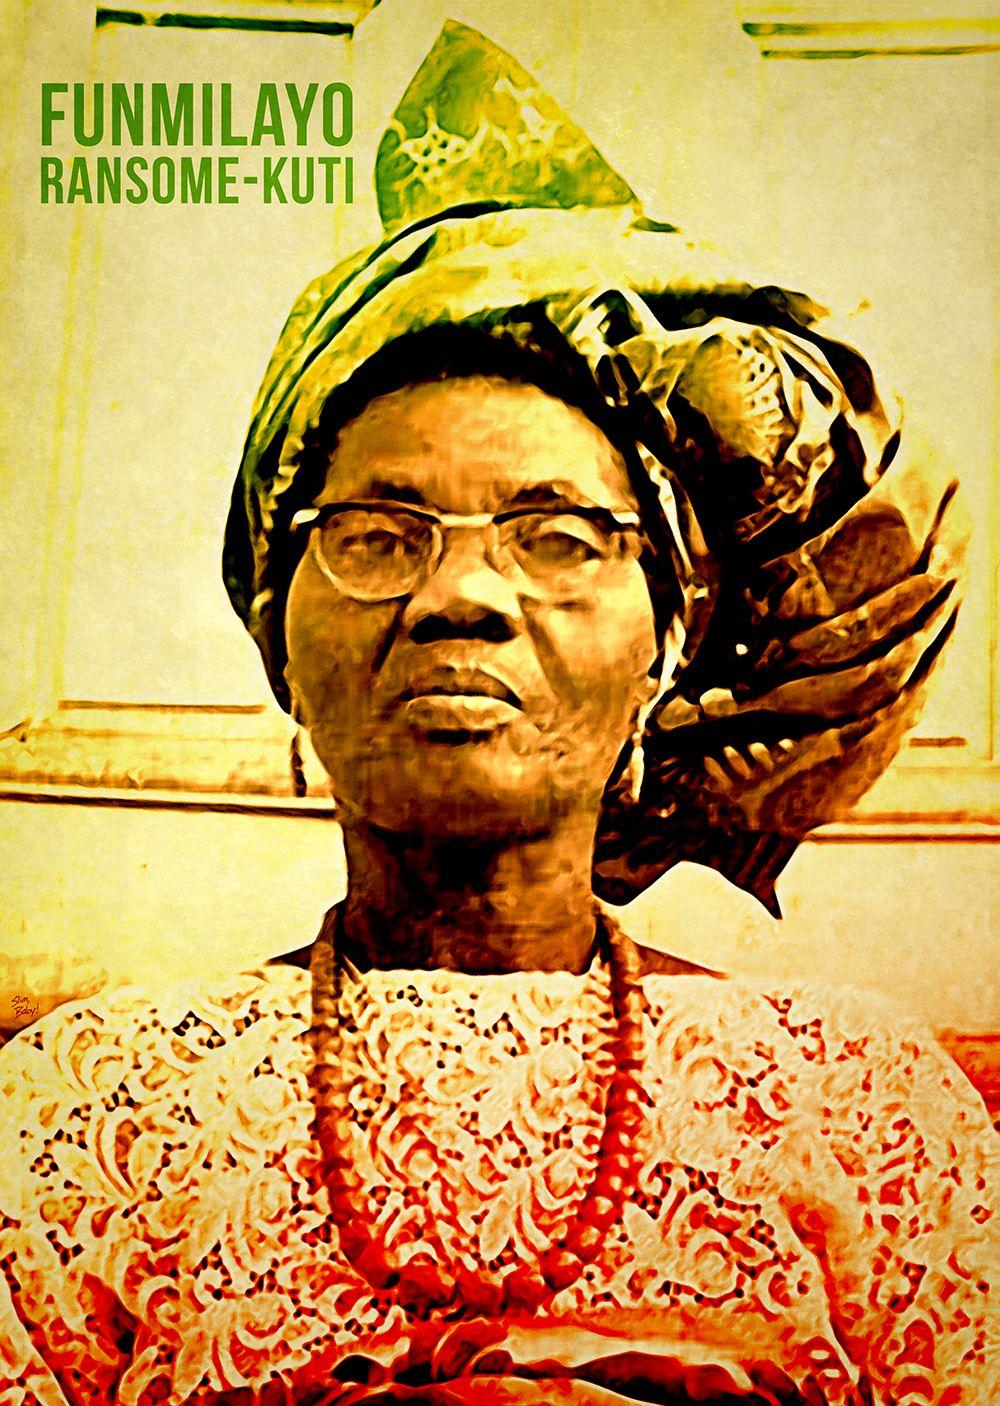 Meet The Three Girls Behind Nigeria's Independence Funmilayo Ransome Kuti art